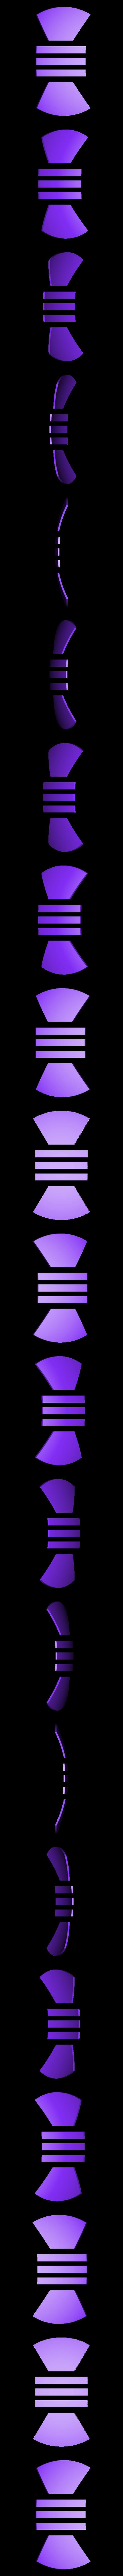 waike3.STL Download free STL file BB-8 • 3D printable template, 3DP_PARK